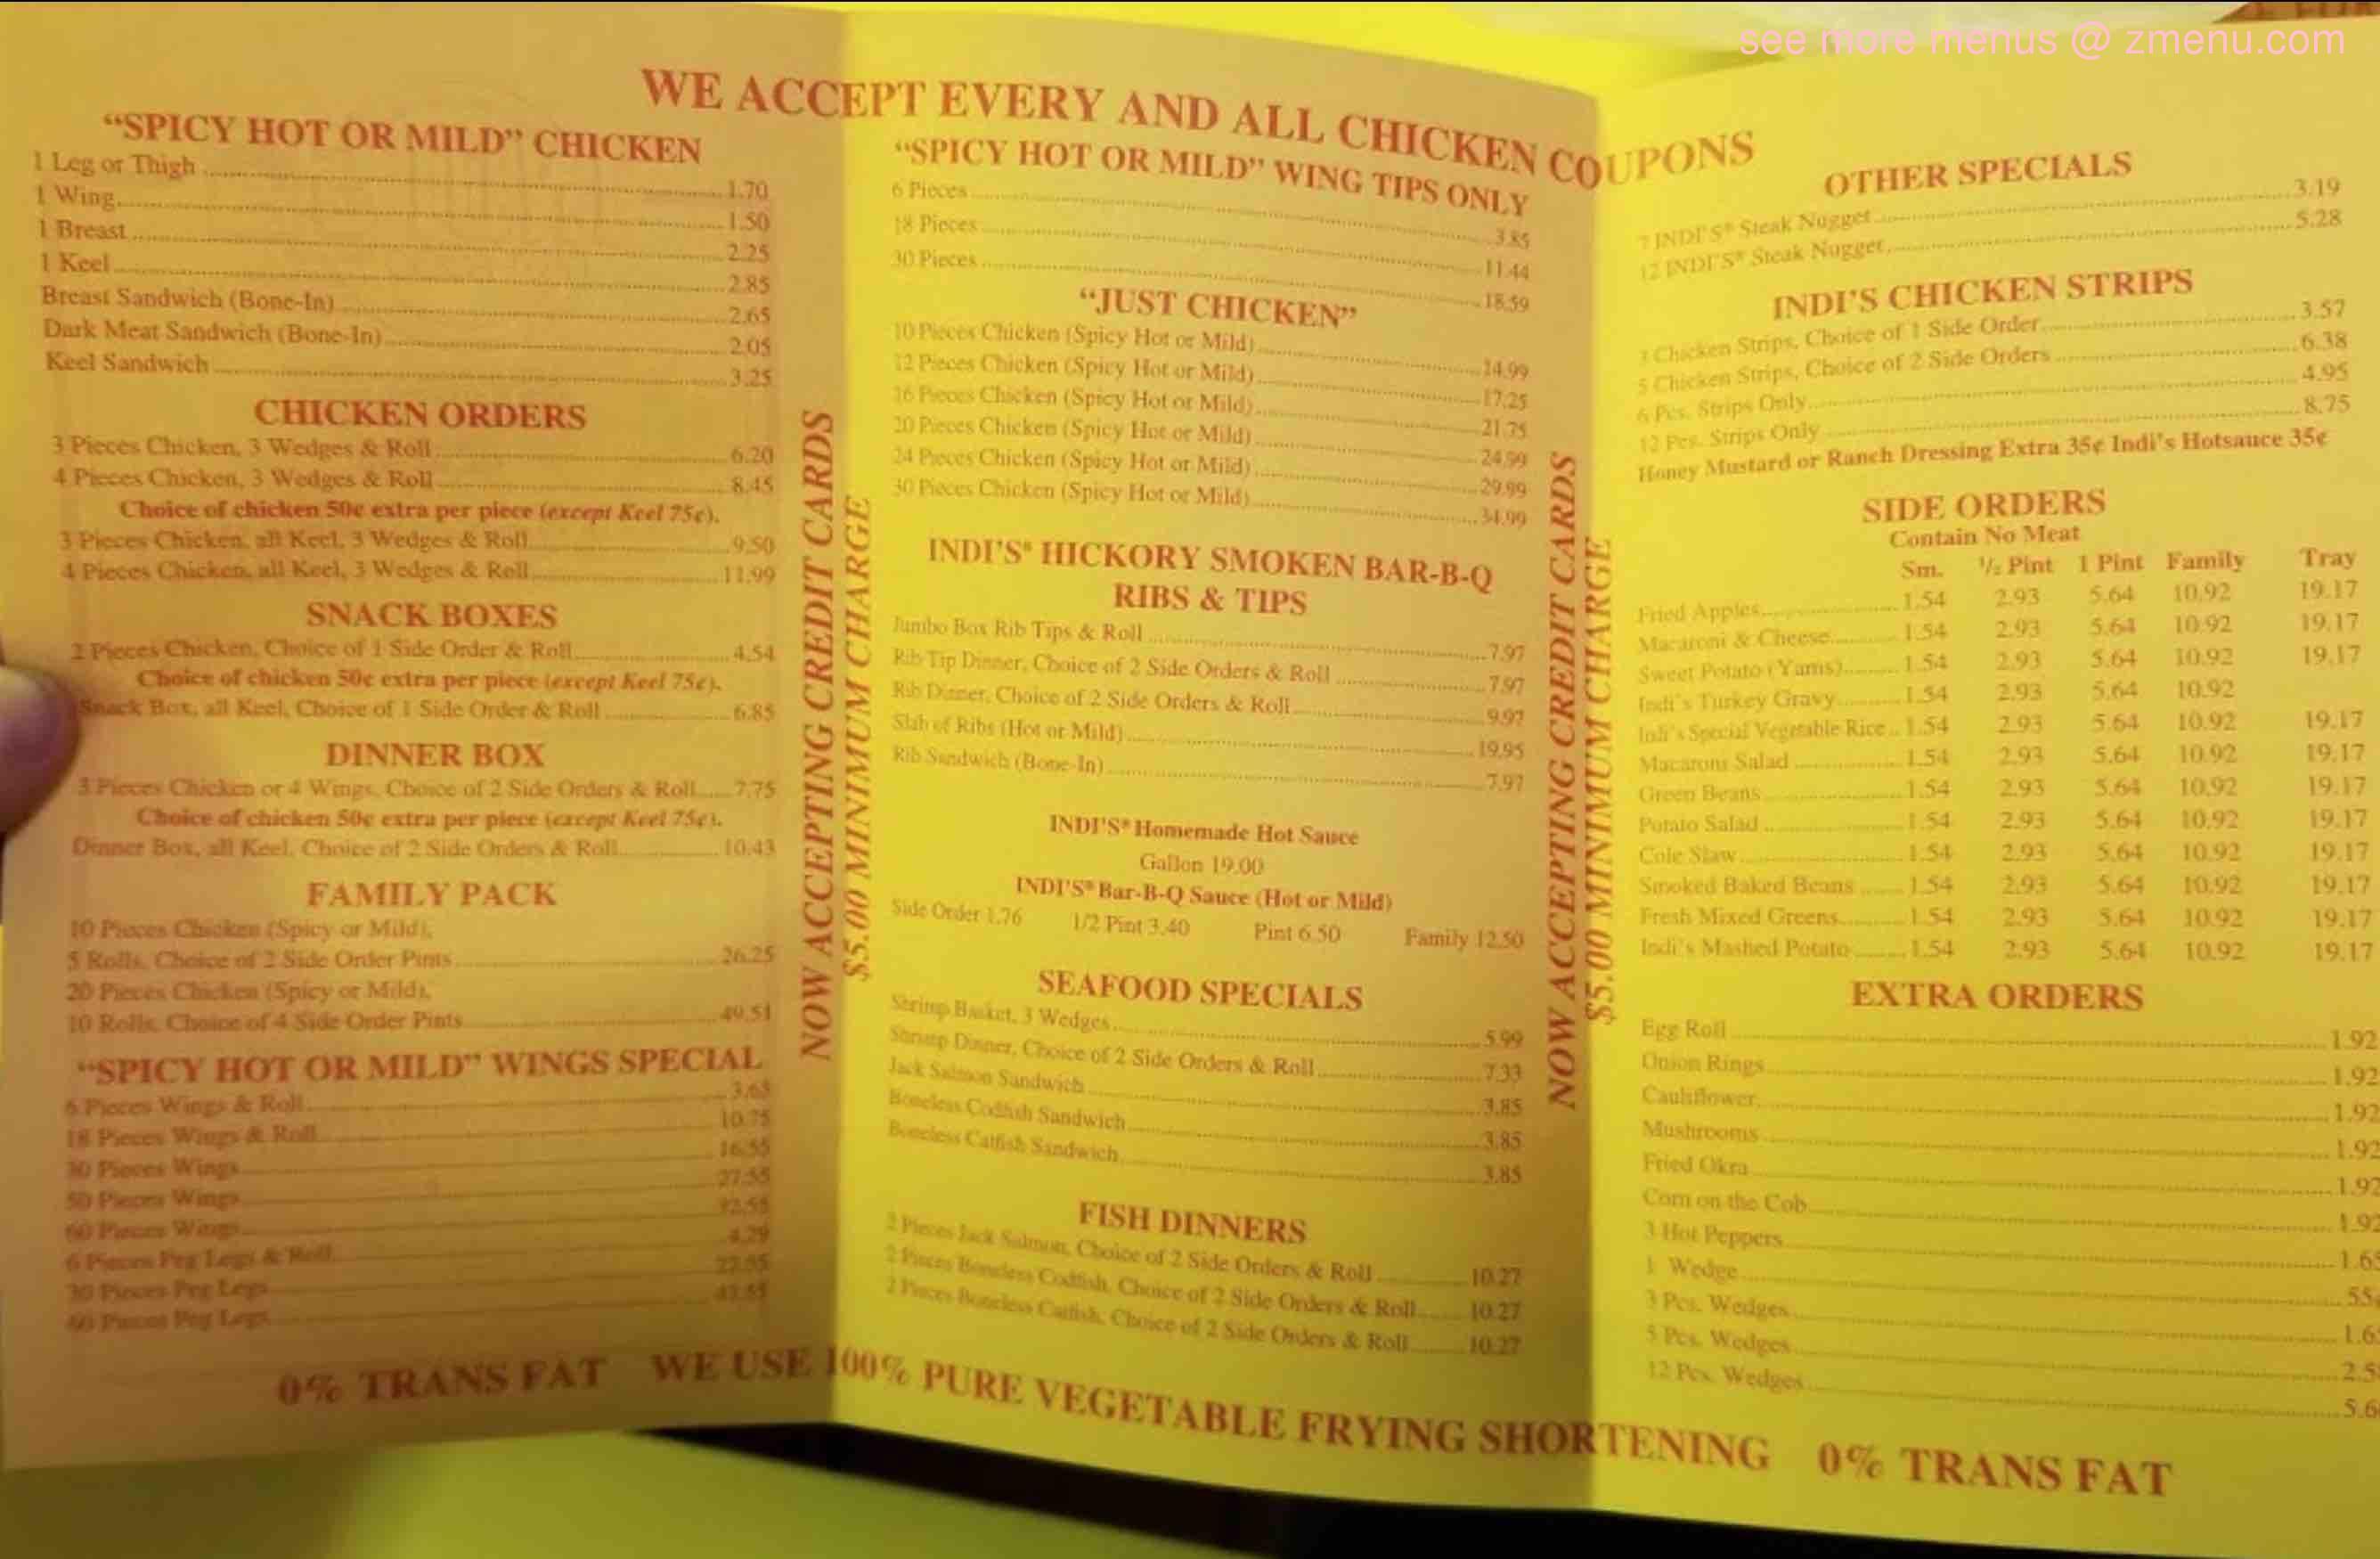 Online Menu Of Indis Fast Food Restaurant Restaurant